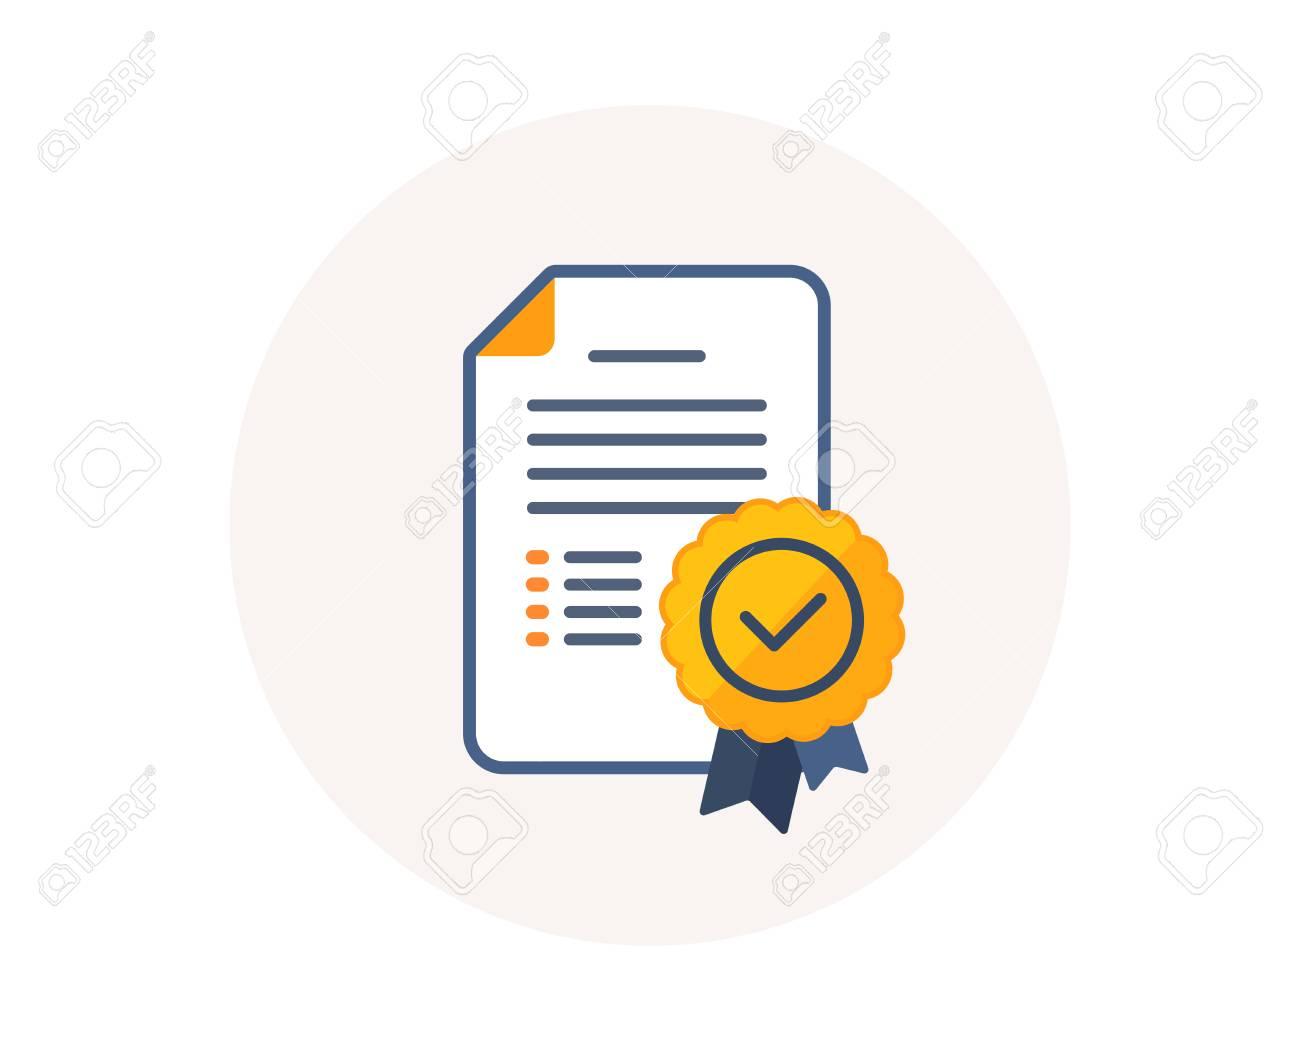 Certificate diploma icon. Graduation document with medal sign. Education certification diploma symbol. Achievement award medal. Certificate document vector. - 111407552